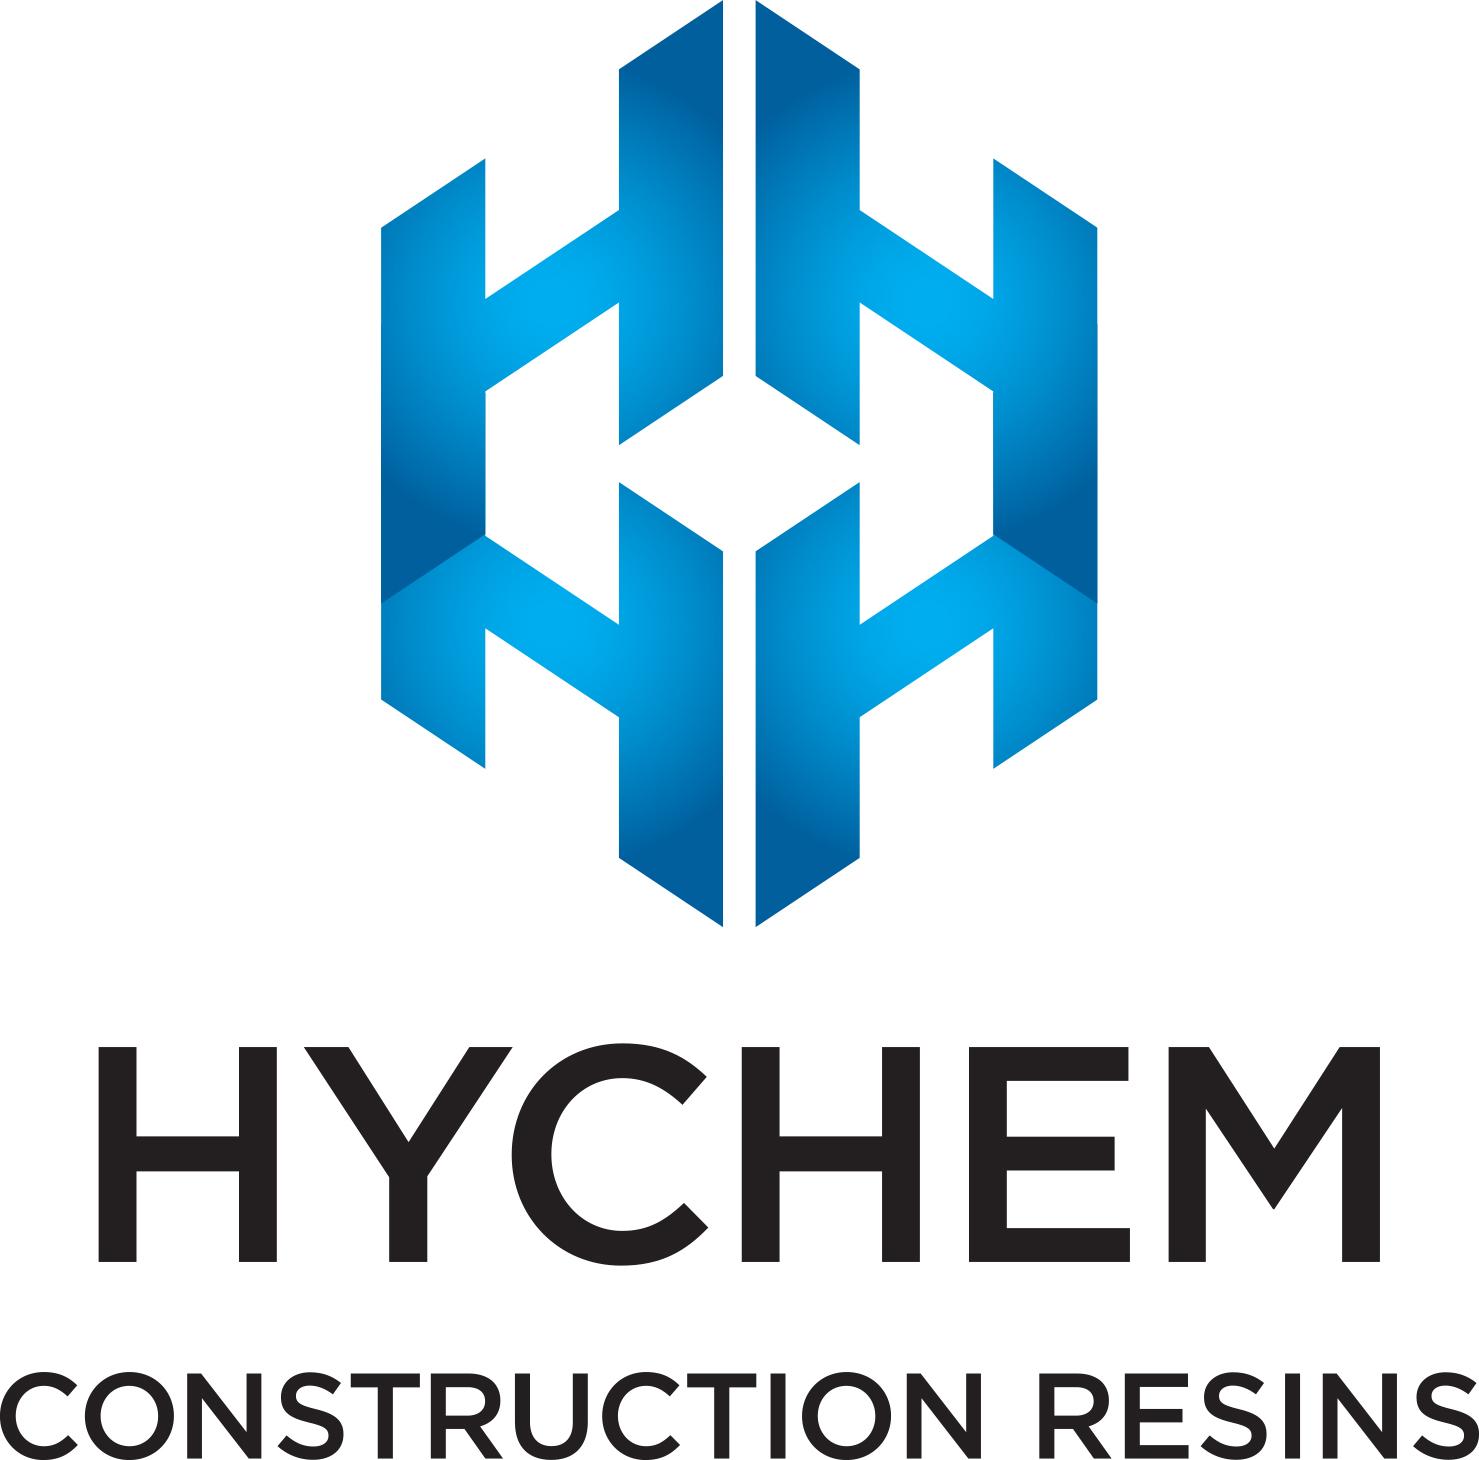 colin murphy - HYCHEM Master_col_ConstructionResin